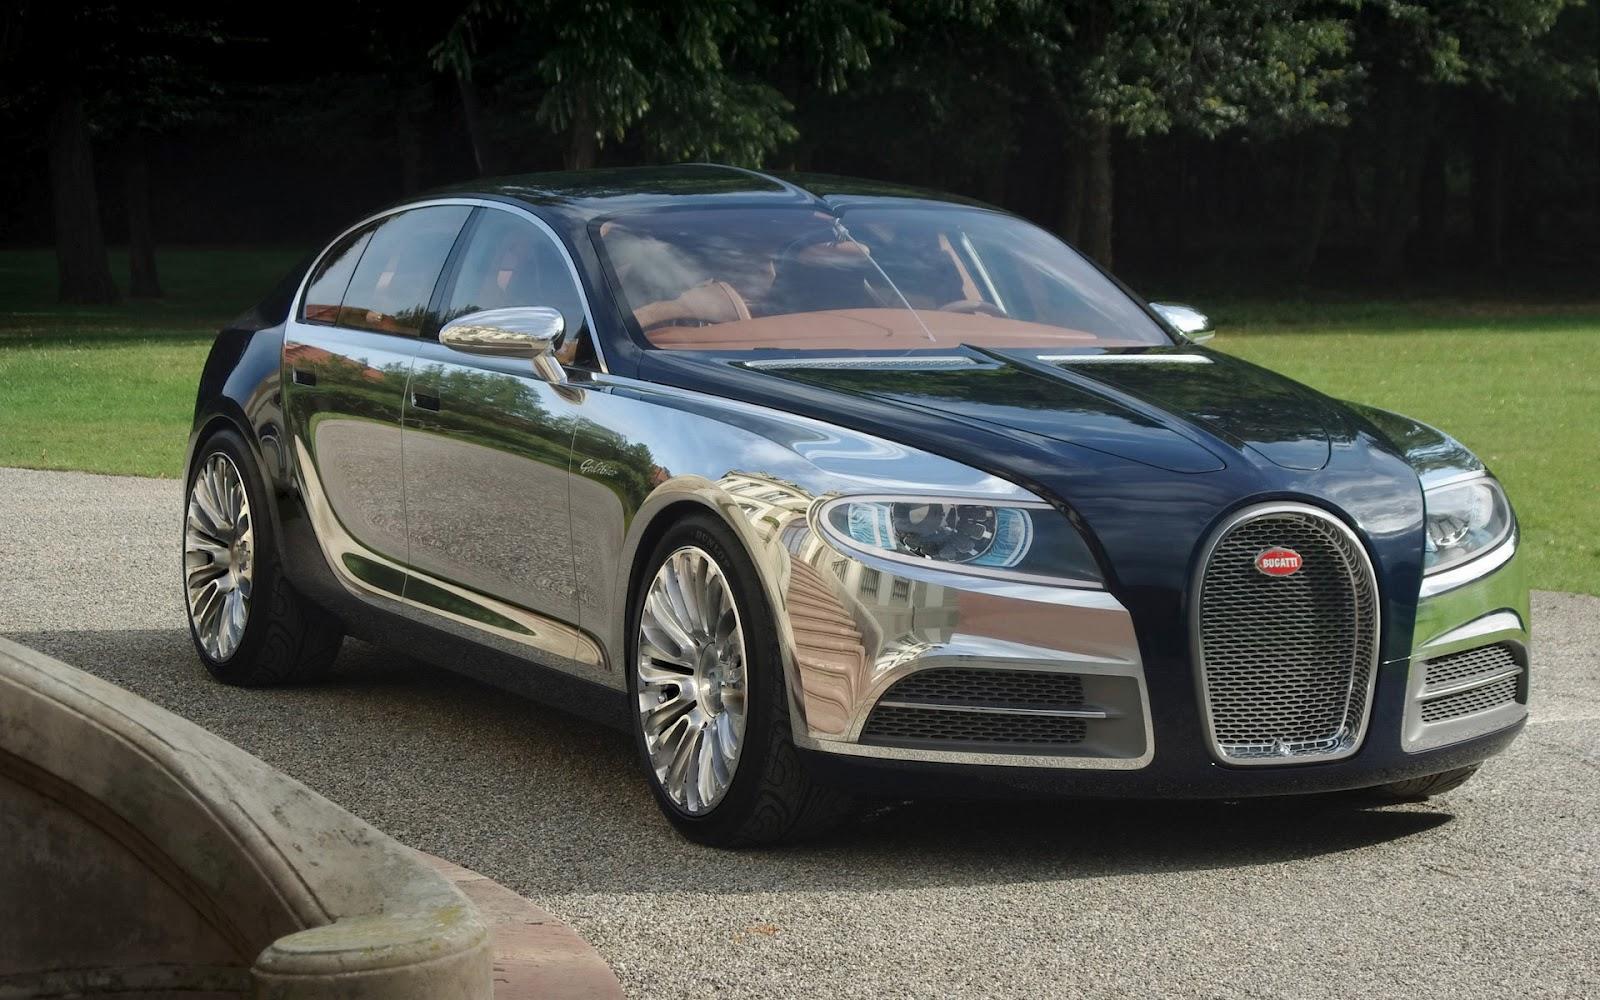 Exotic cars wallpaper Hd 1600x1000